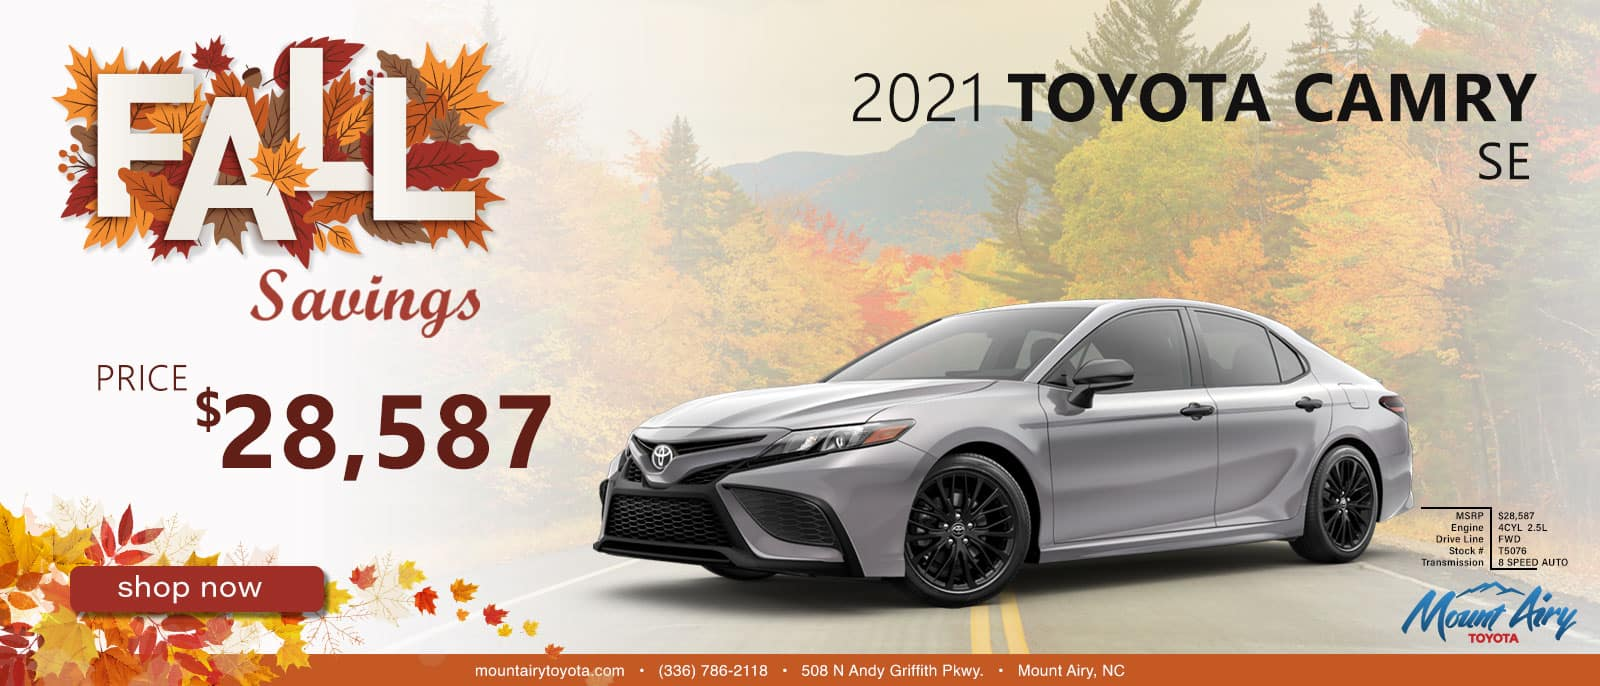 2021 Toyota Mount Airy, NC